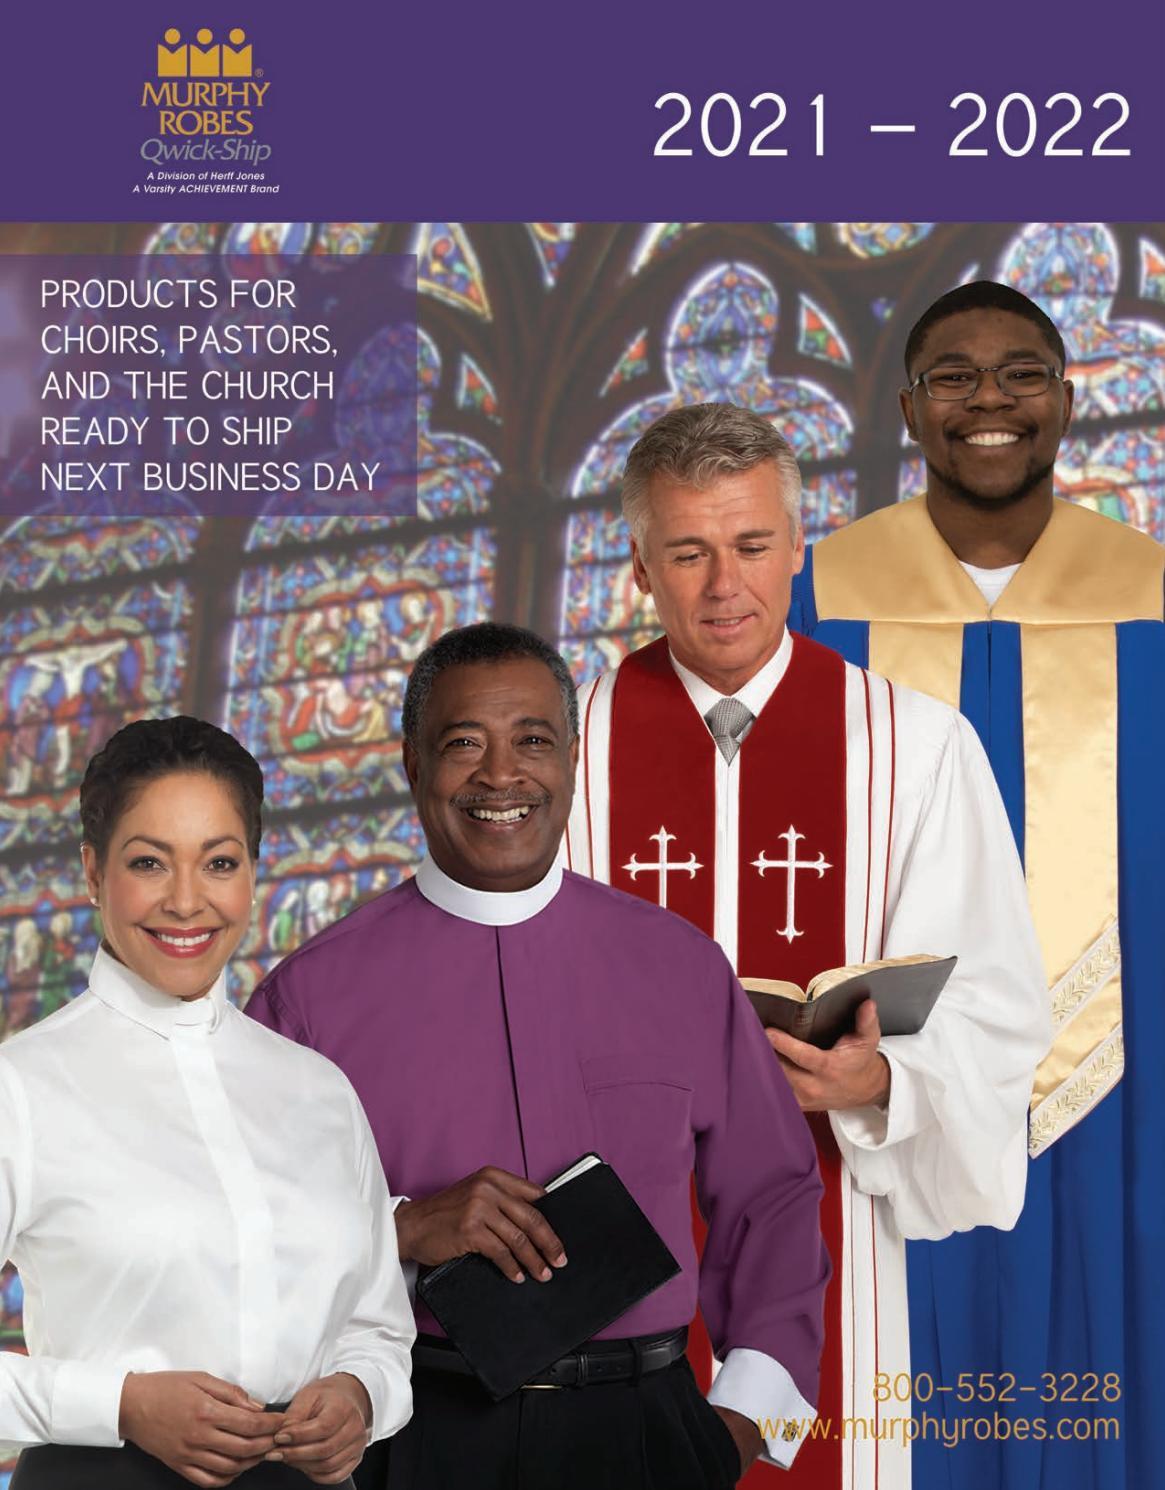 Women/'s Minister Cassock Choir Cassock Robe Clergy Vestment Cardinal Priest robe